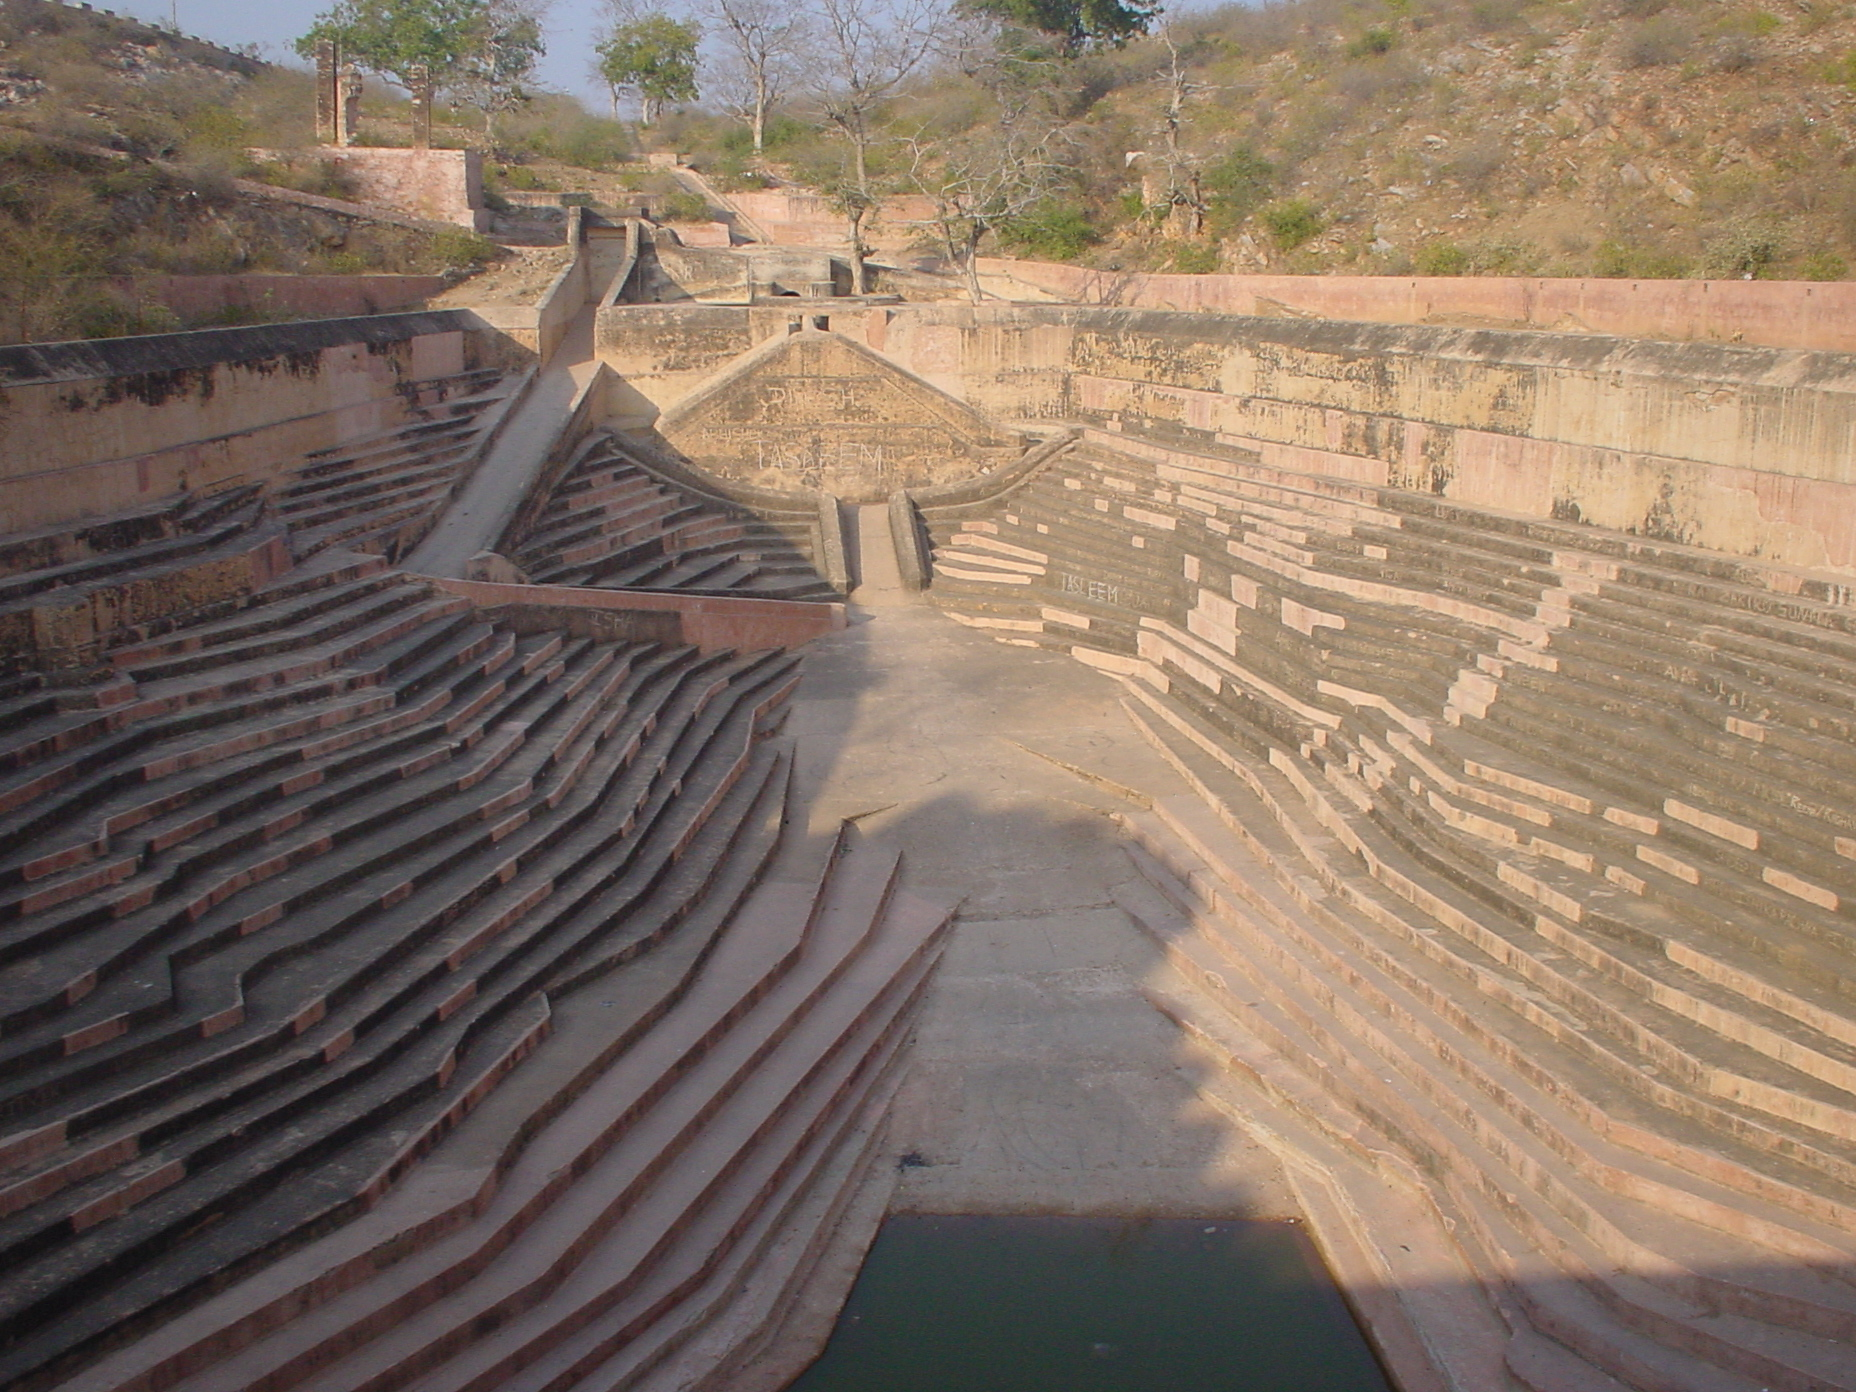 place-of-rang-de-basanti-shut-nahargarh-fort